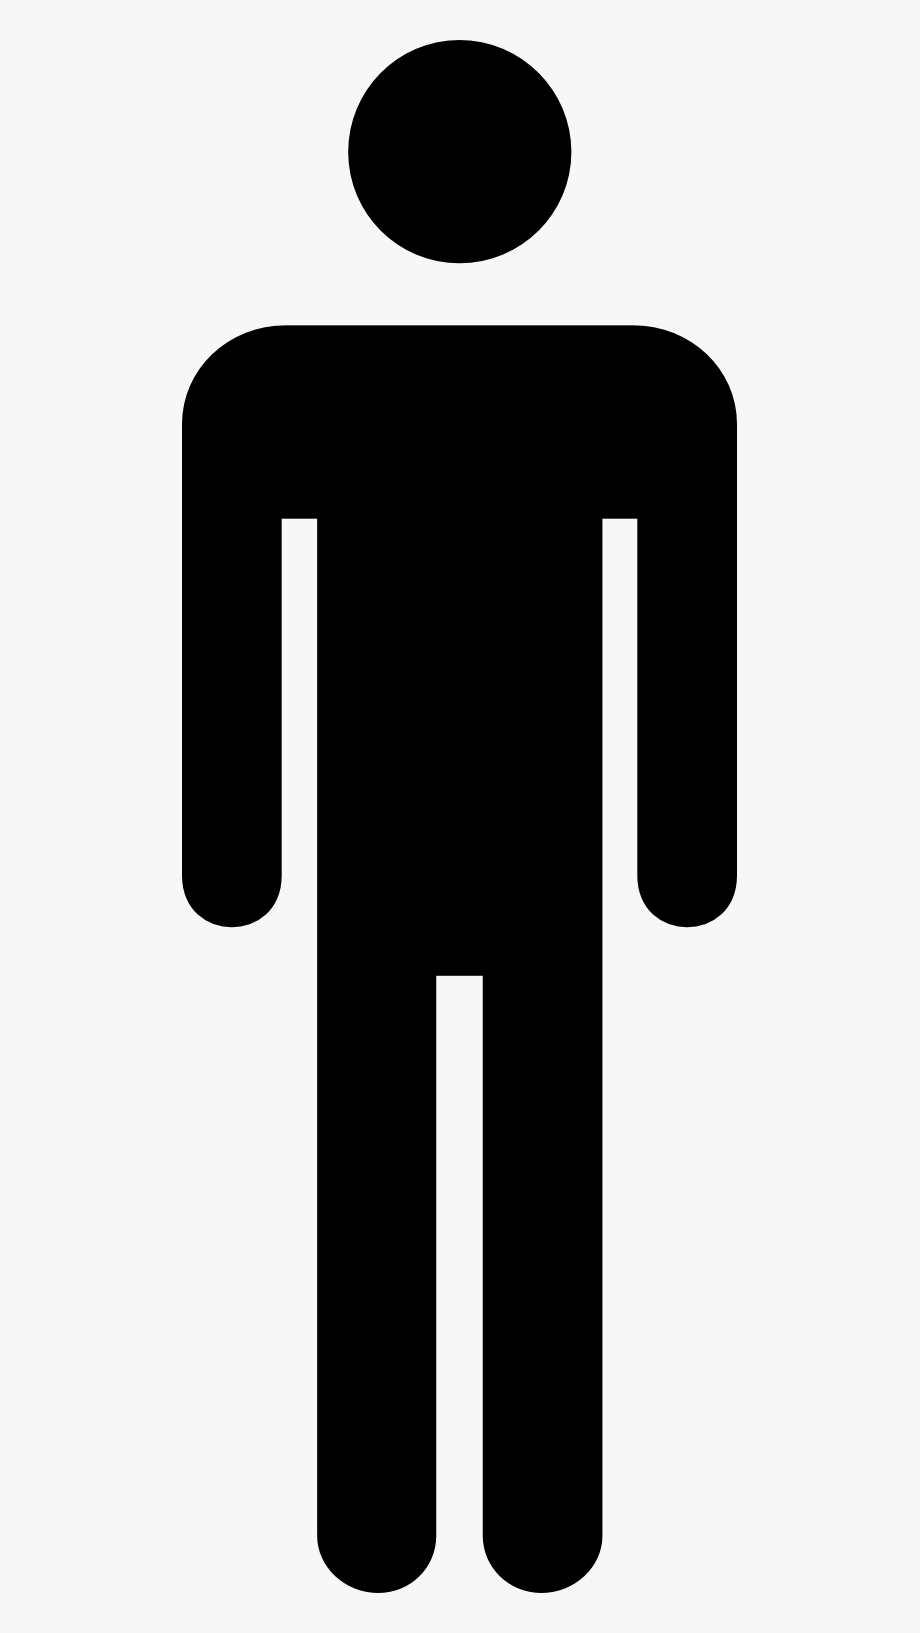 Stick person silhouette clipart jpg stock Stick Man Pics - Stick Man Silhouette Png #468825 - Free ... jpg stock